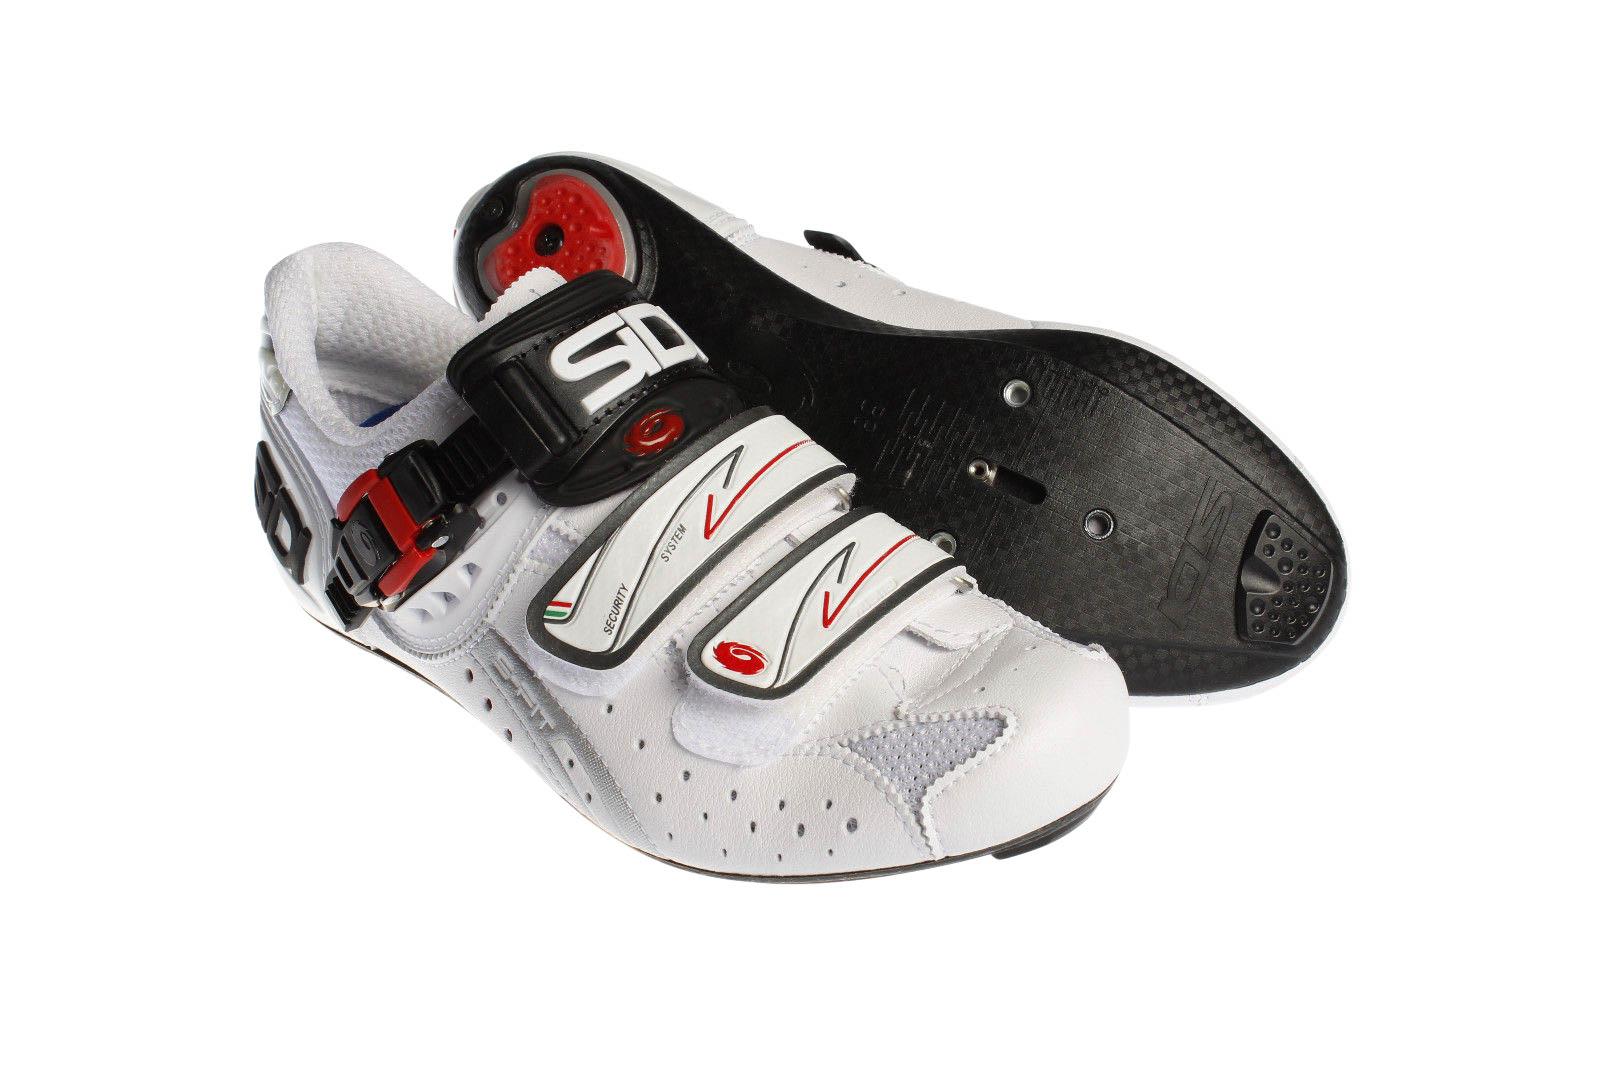 7a2cc9dee3a5a2 Sidi Genius 5-Fit Carbon White White Shoes | Shoes & Shoecovers